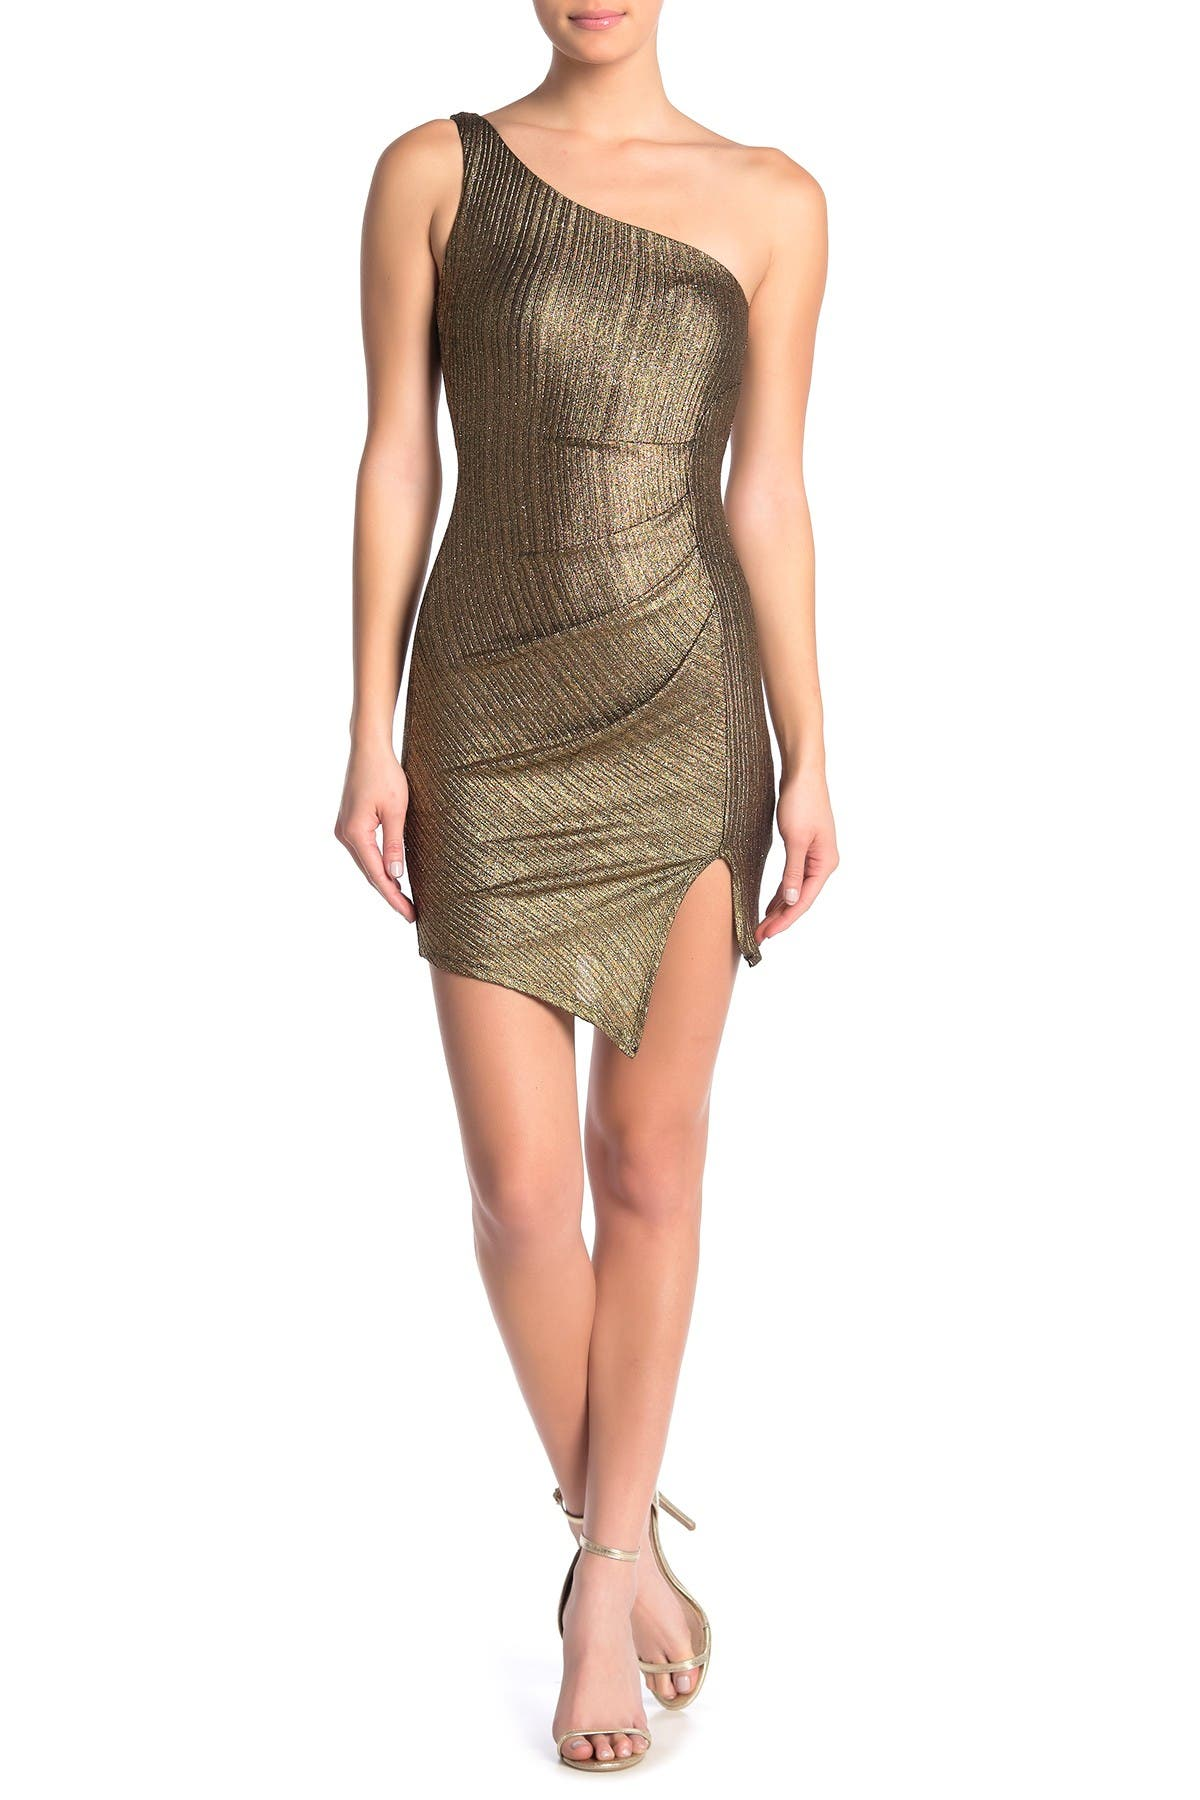 JUMP One Shoulder Glitter Mini Dress